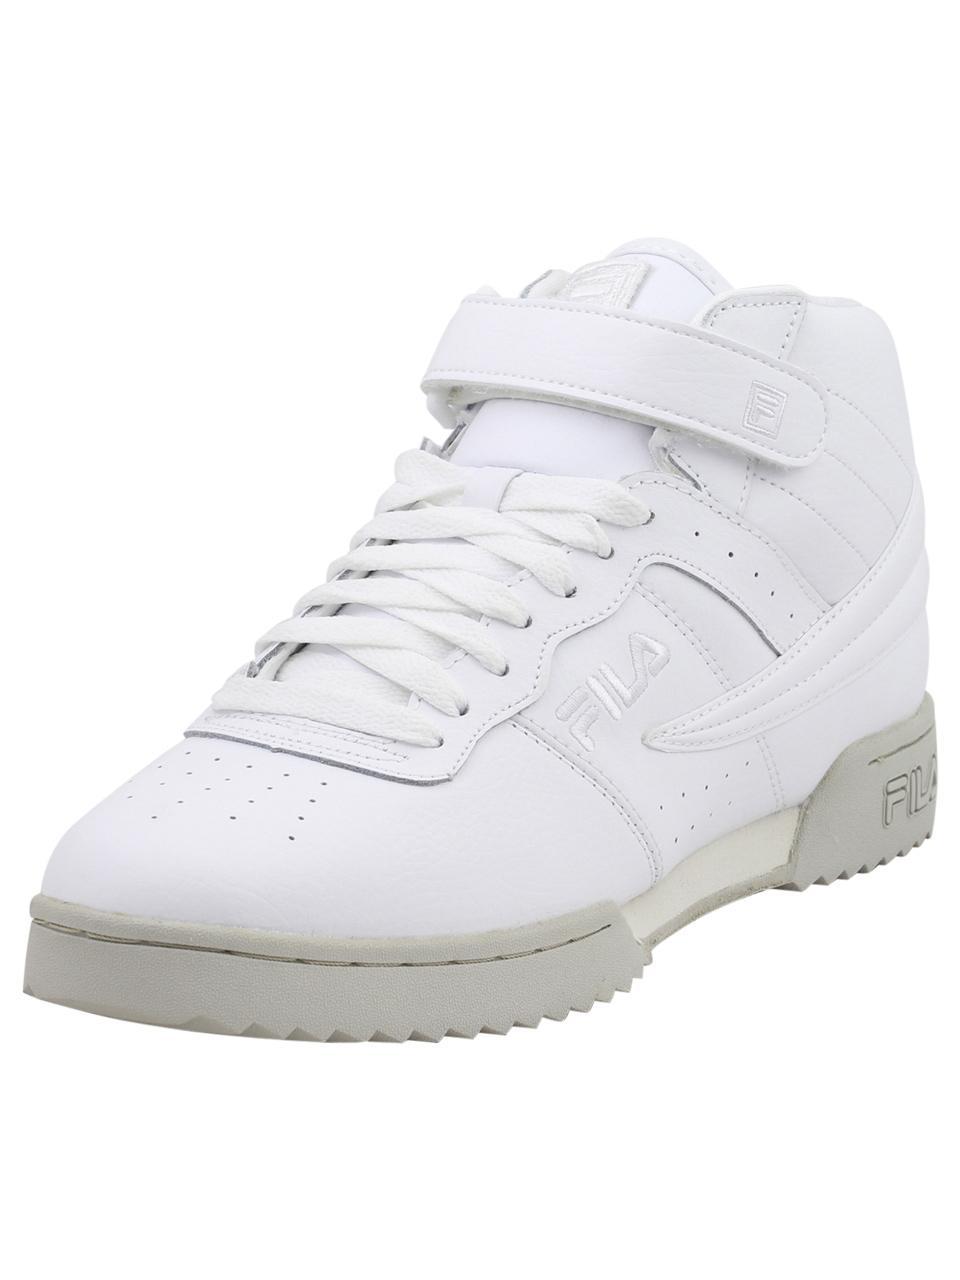 47af76201c2f Fila Men s F-13-Ripple High Top Sneakers Shoes